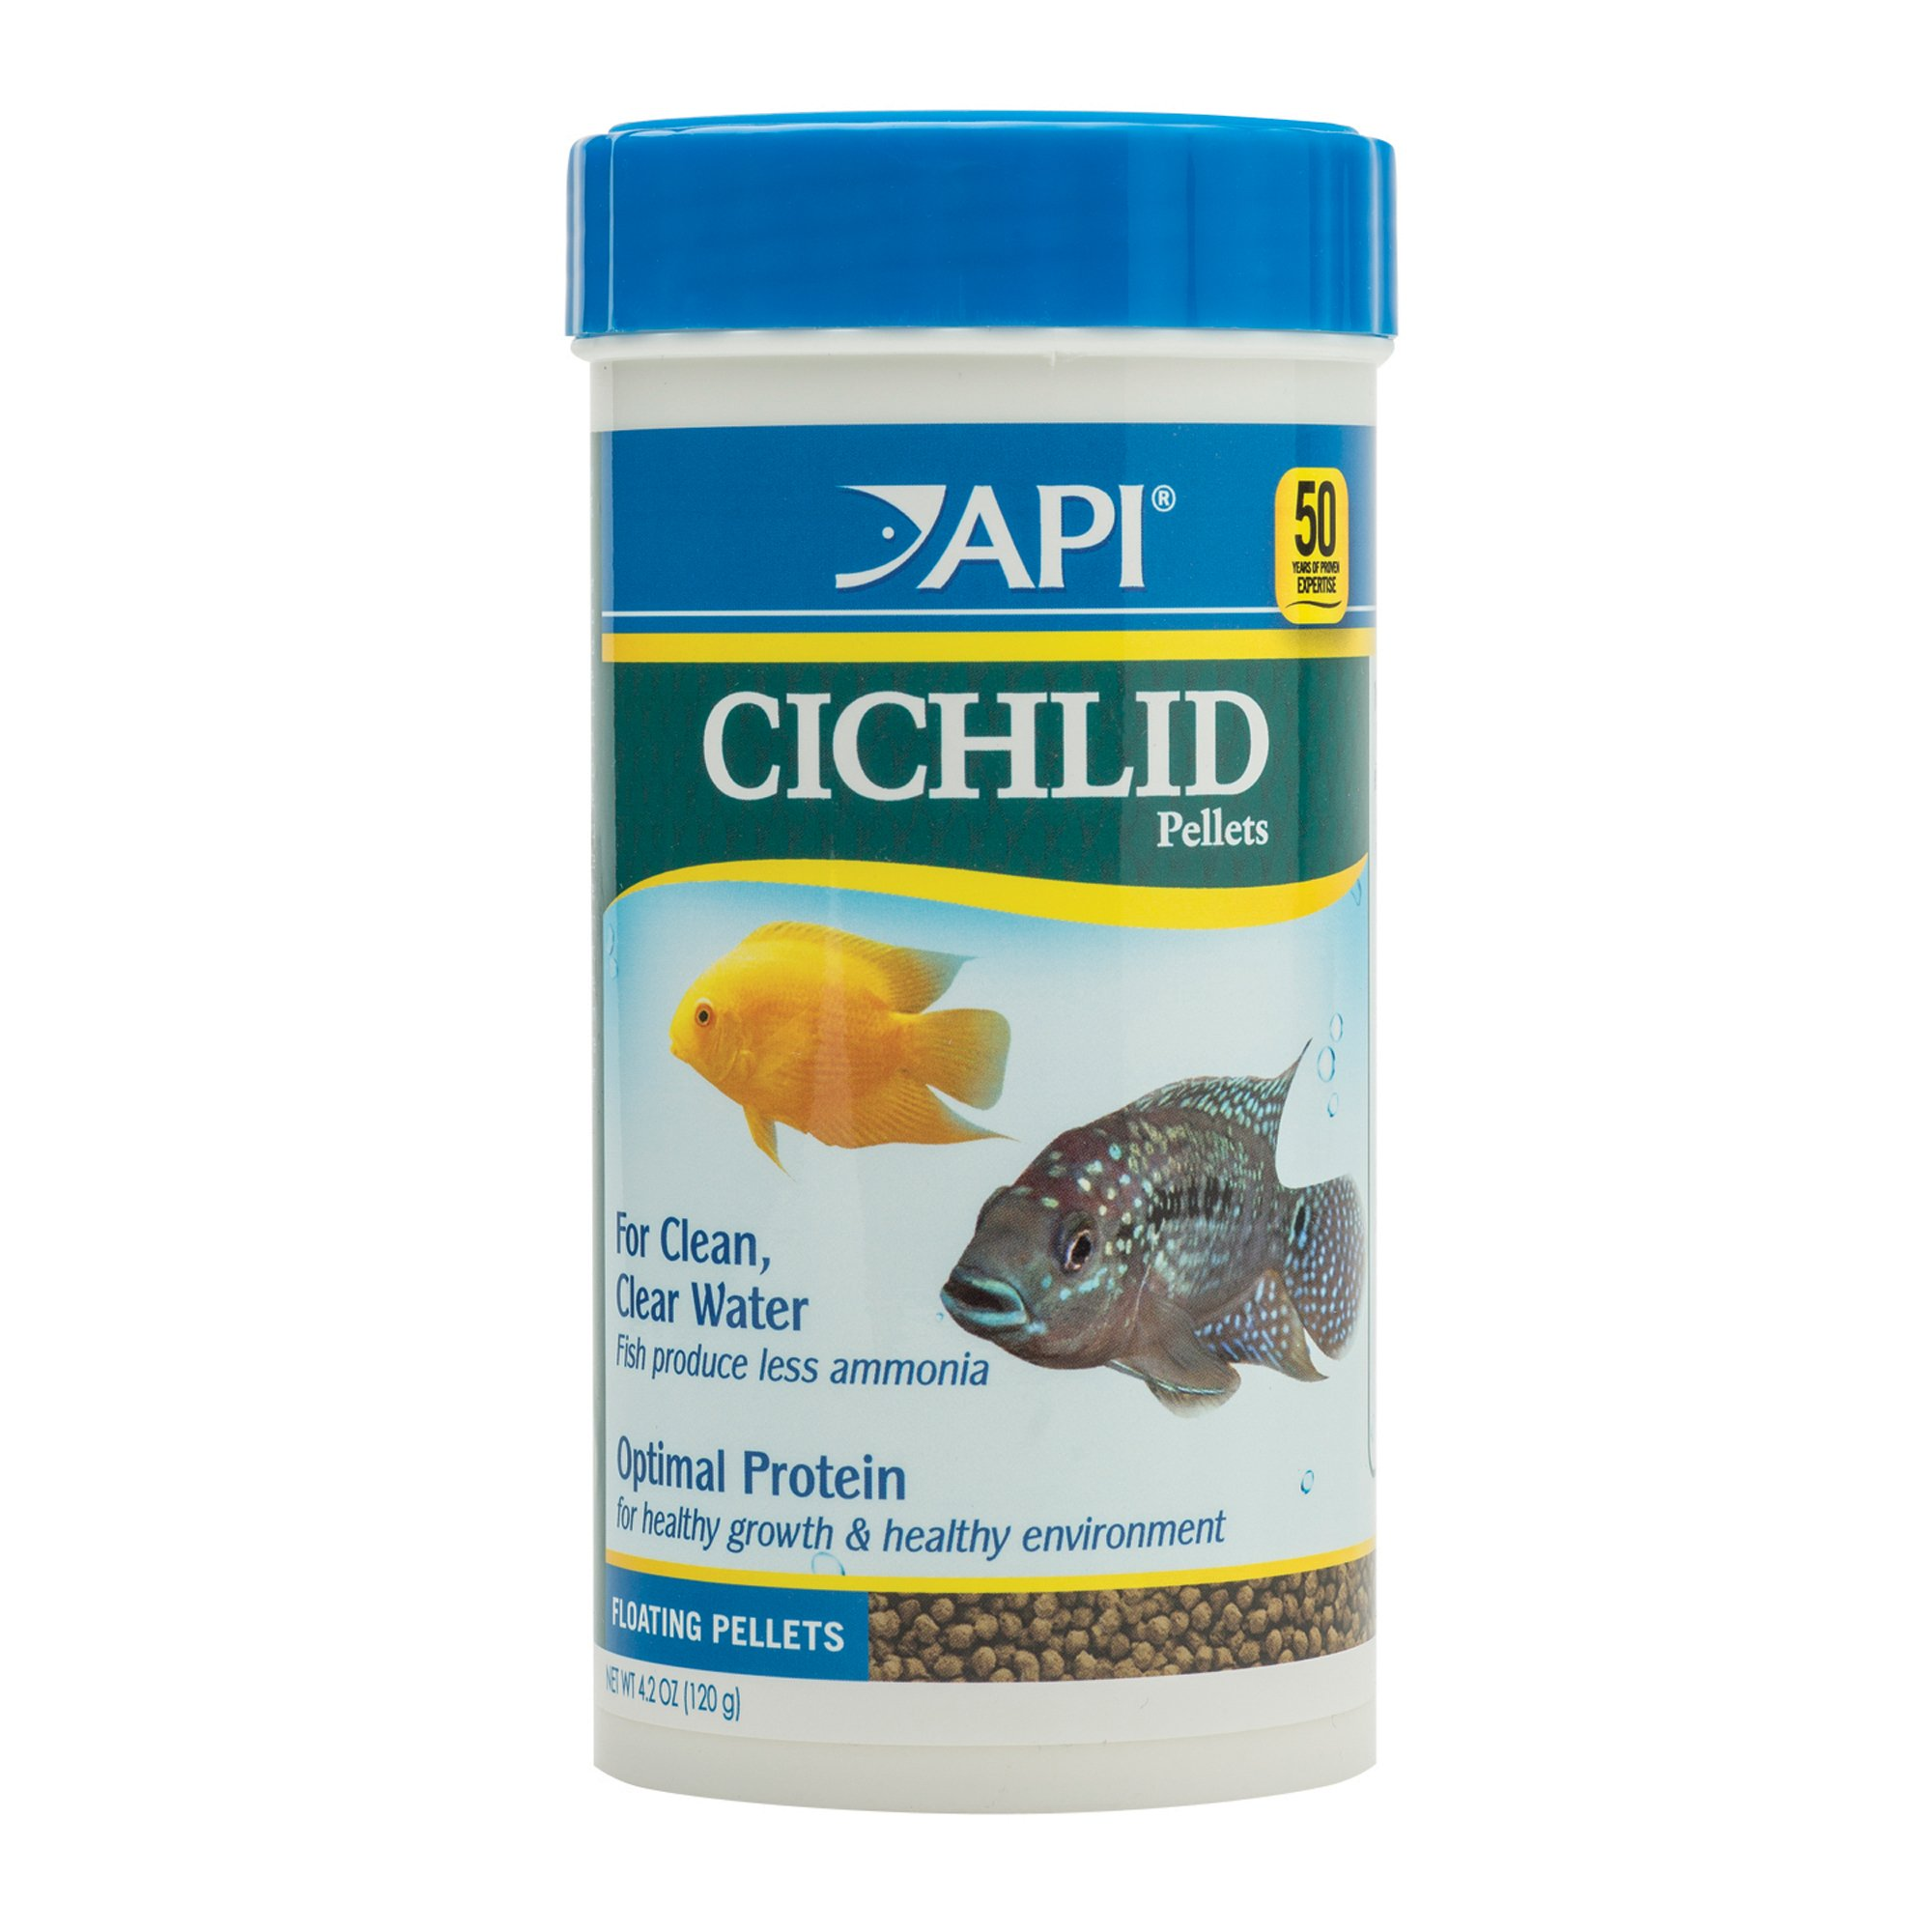 Api cichlid pellets floating pellets fish food petco for Petco fish food